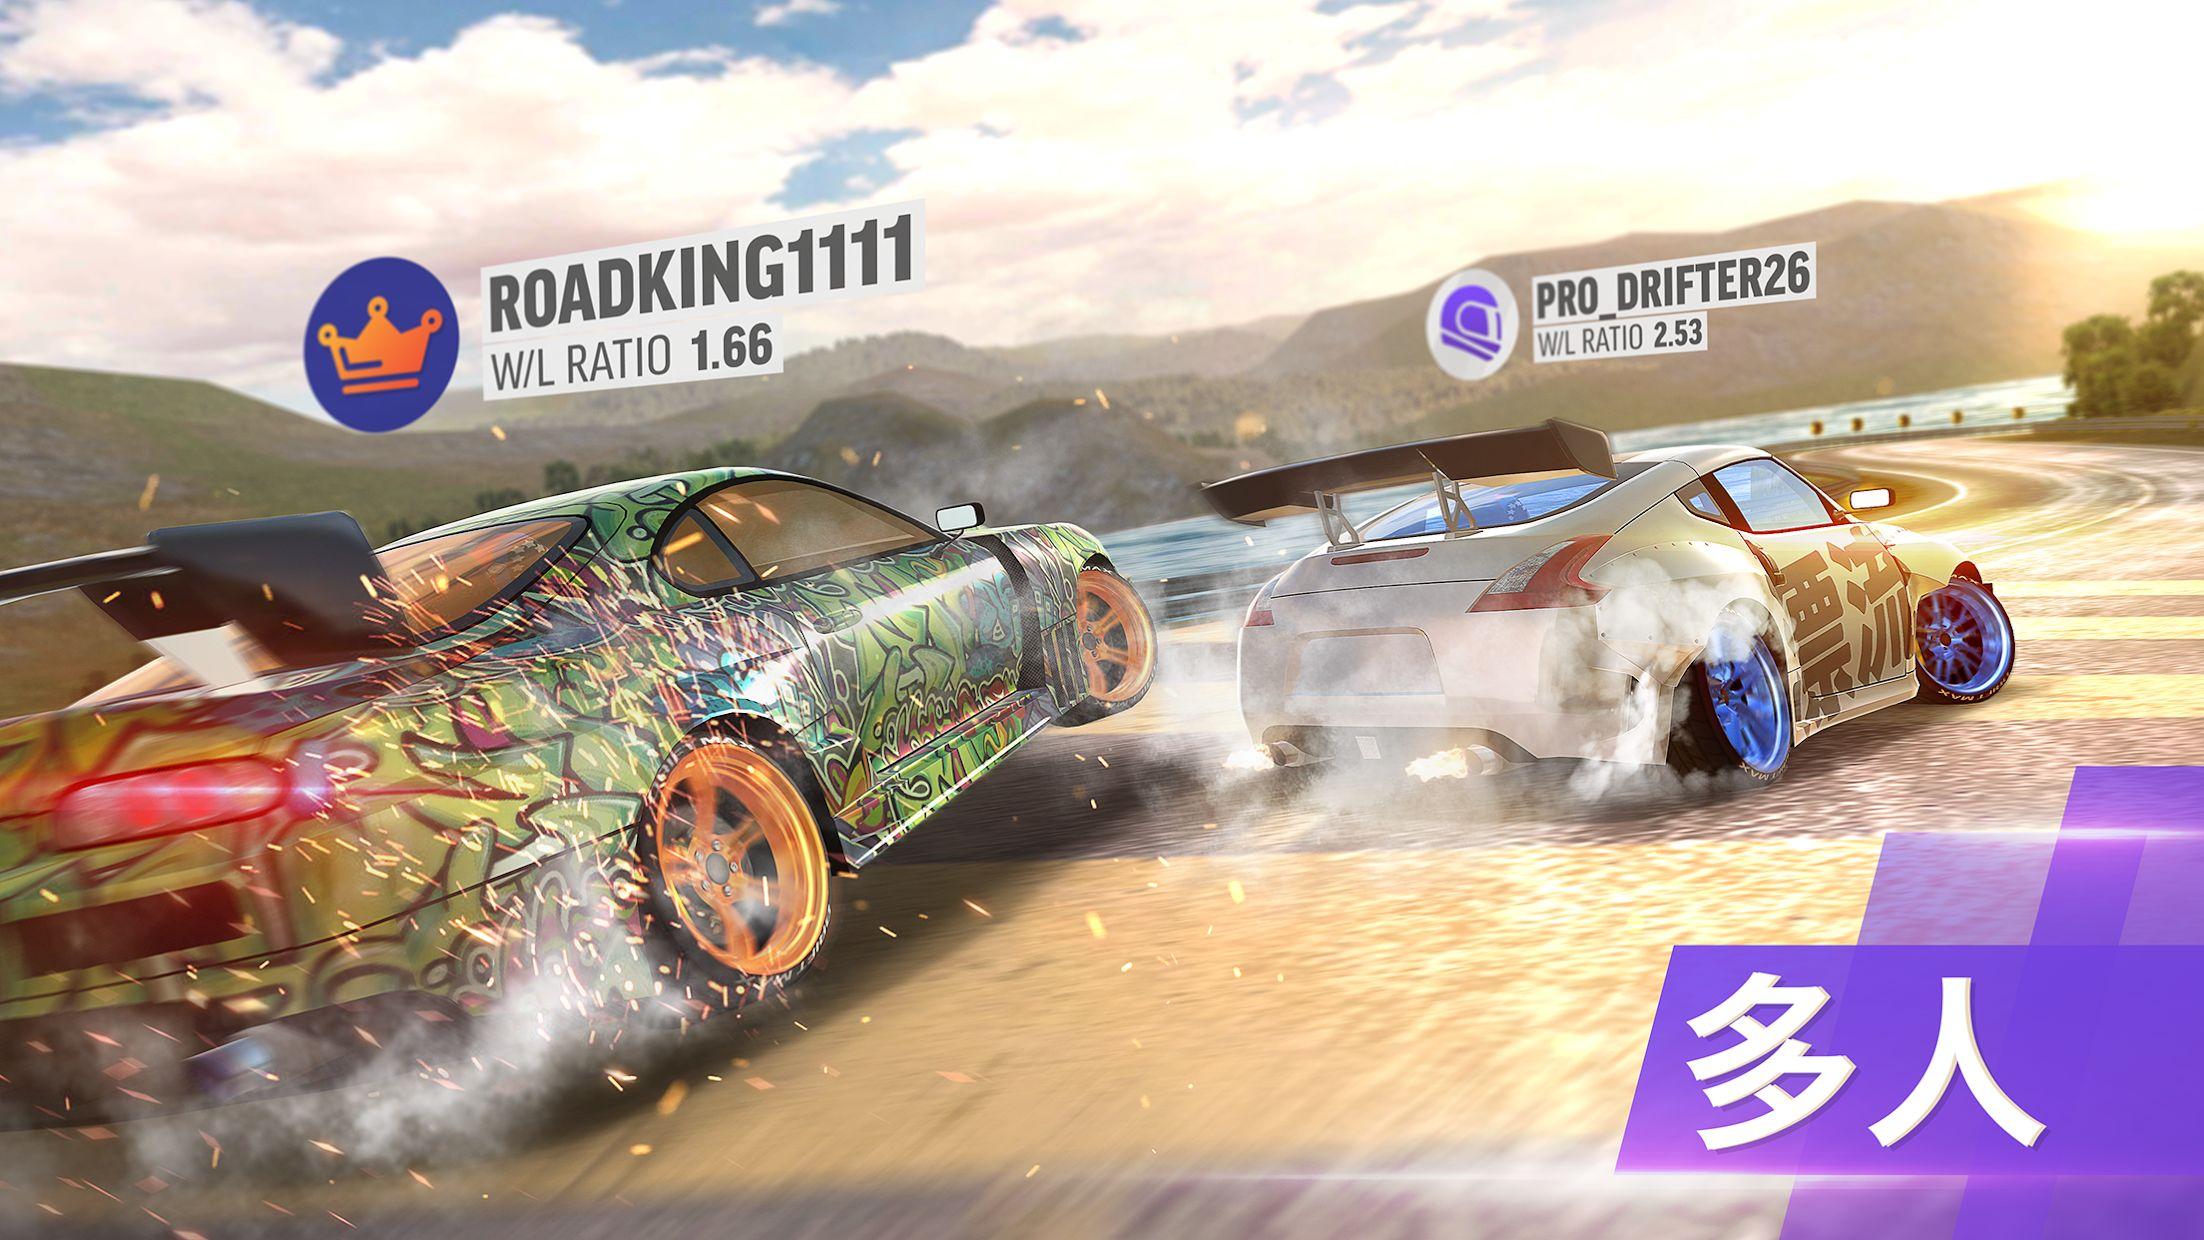 Drift Max Pro (极限漂移专家) - 赛车漂移游戏 游戏截图3